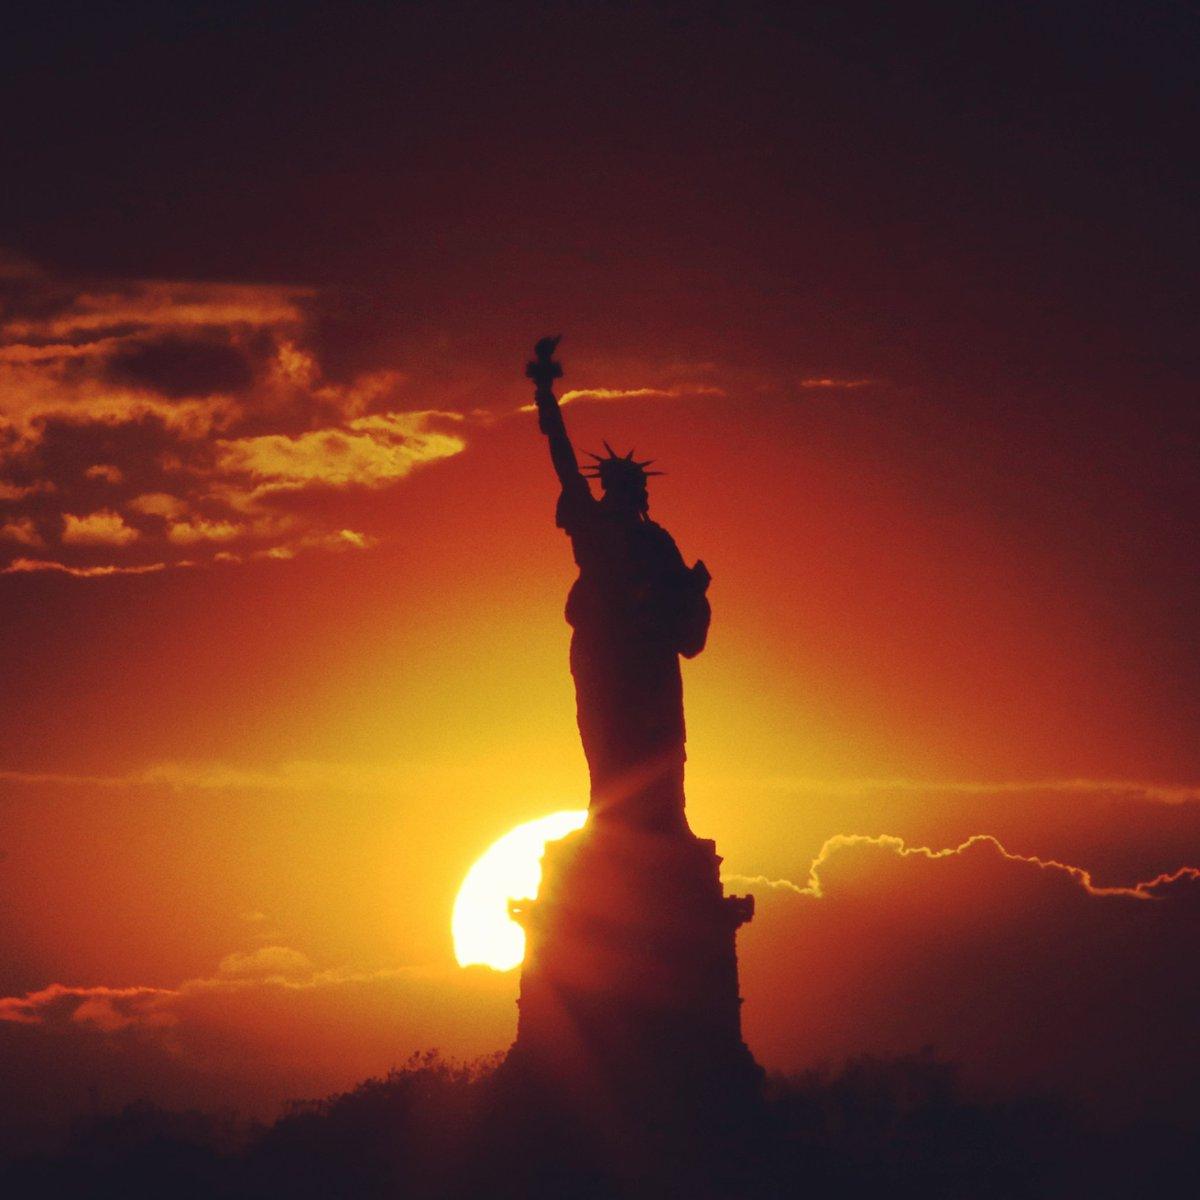 Statue Of Liberty by @GaryHershorn #newyork #nyc<br>http://pic.twitter.com/g32C5kZpc5